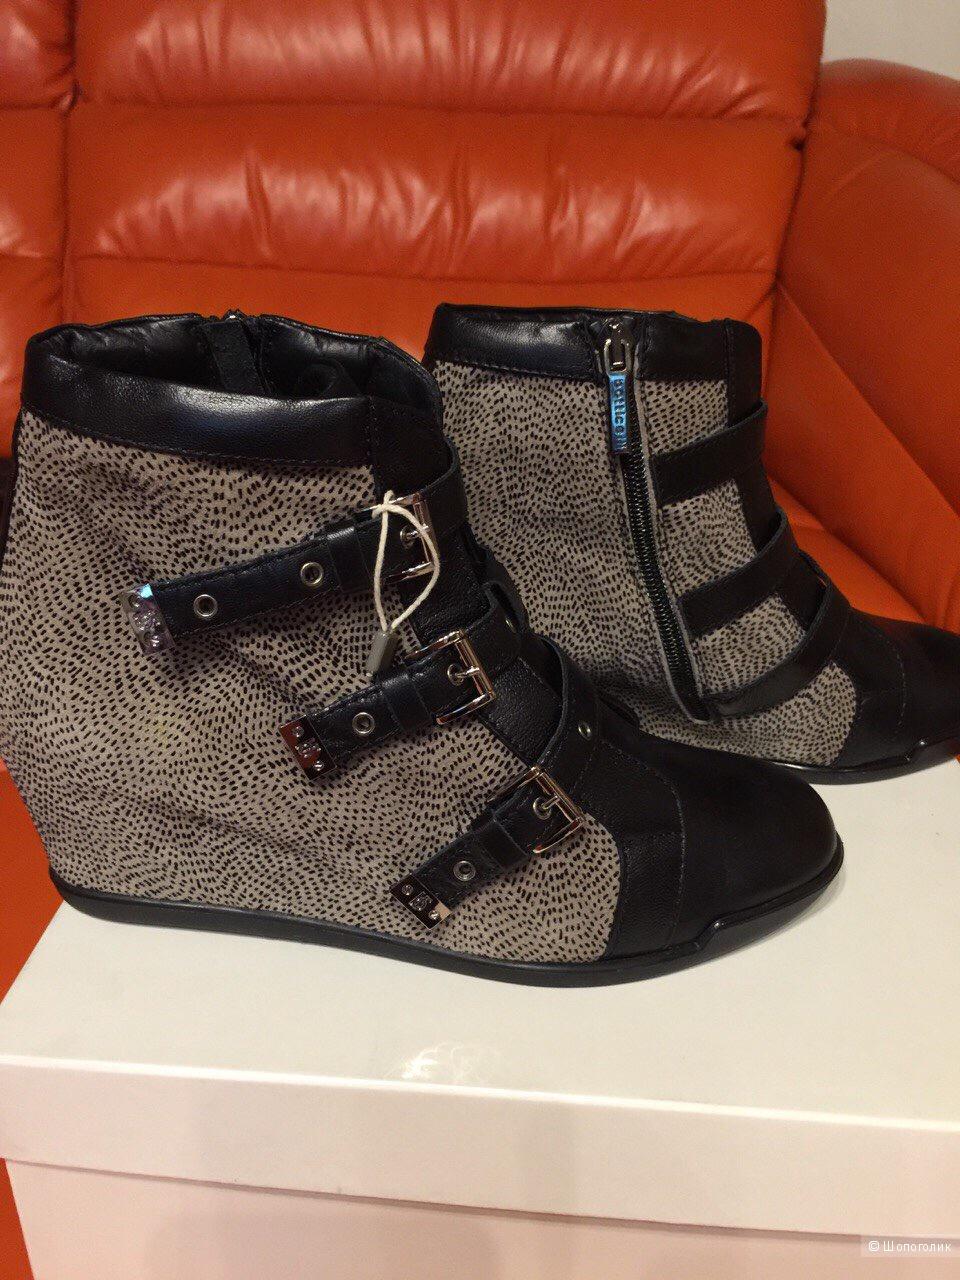 Botticelli limited новые сникерсы кроссовки 37-38